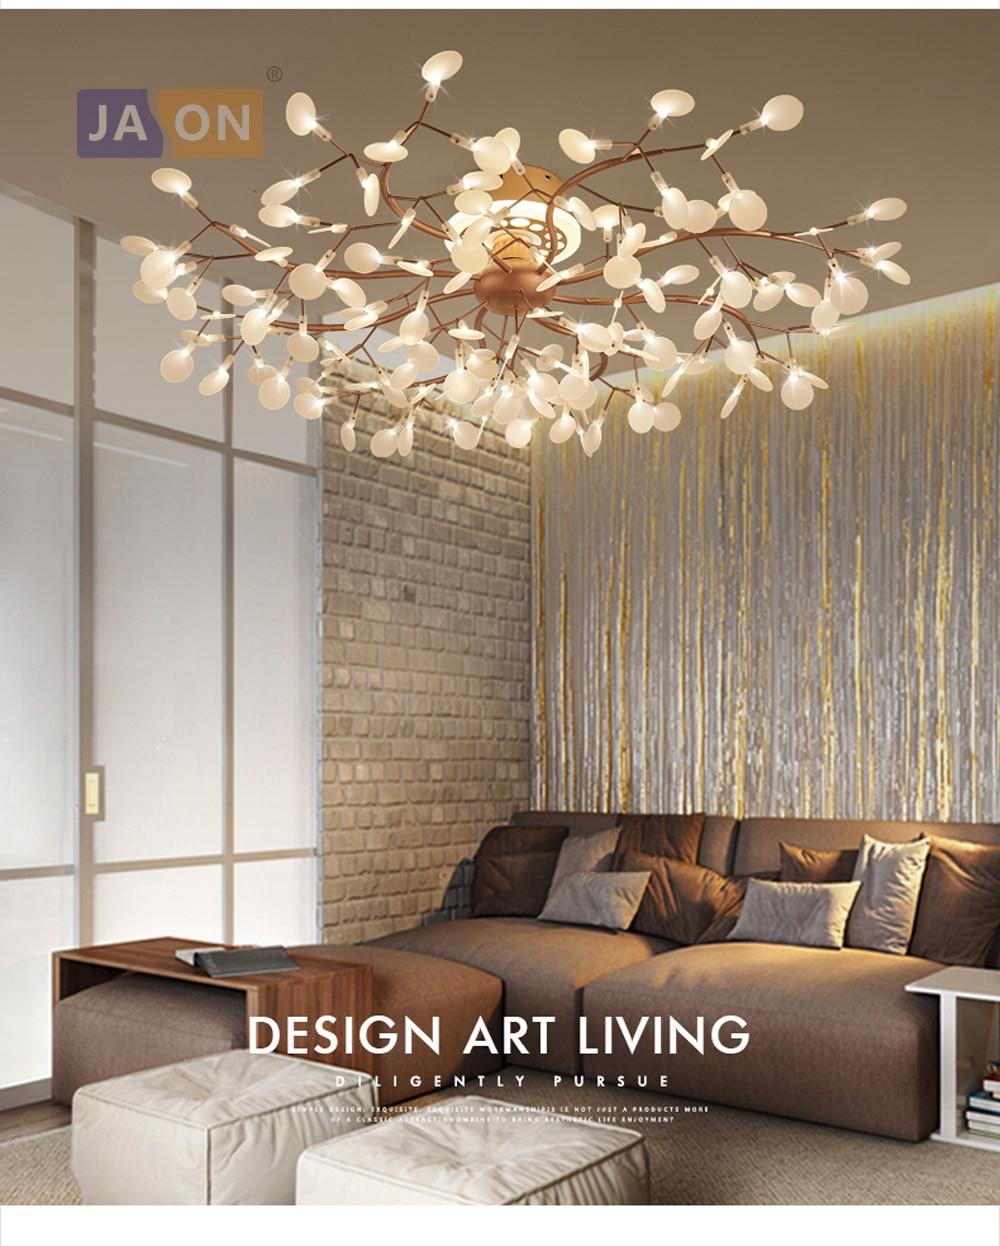 Floor Lamps Diligent Led Postmodern Iron Acryl Coffee Minimalism Led Lamp Led Light Led Floor Lamp Floor Light For Foyer Dinning Room Bedroom